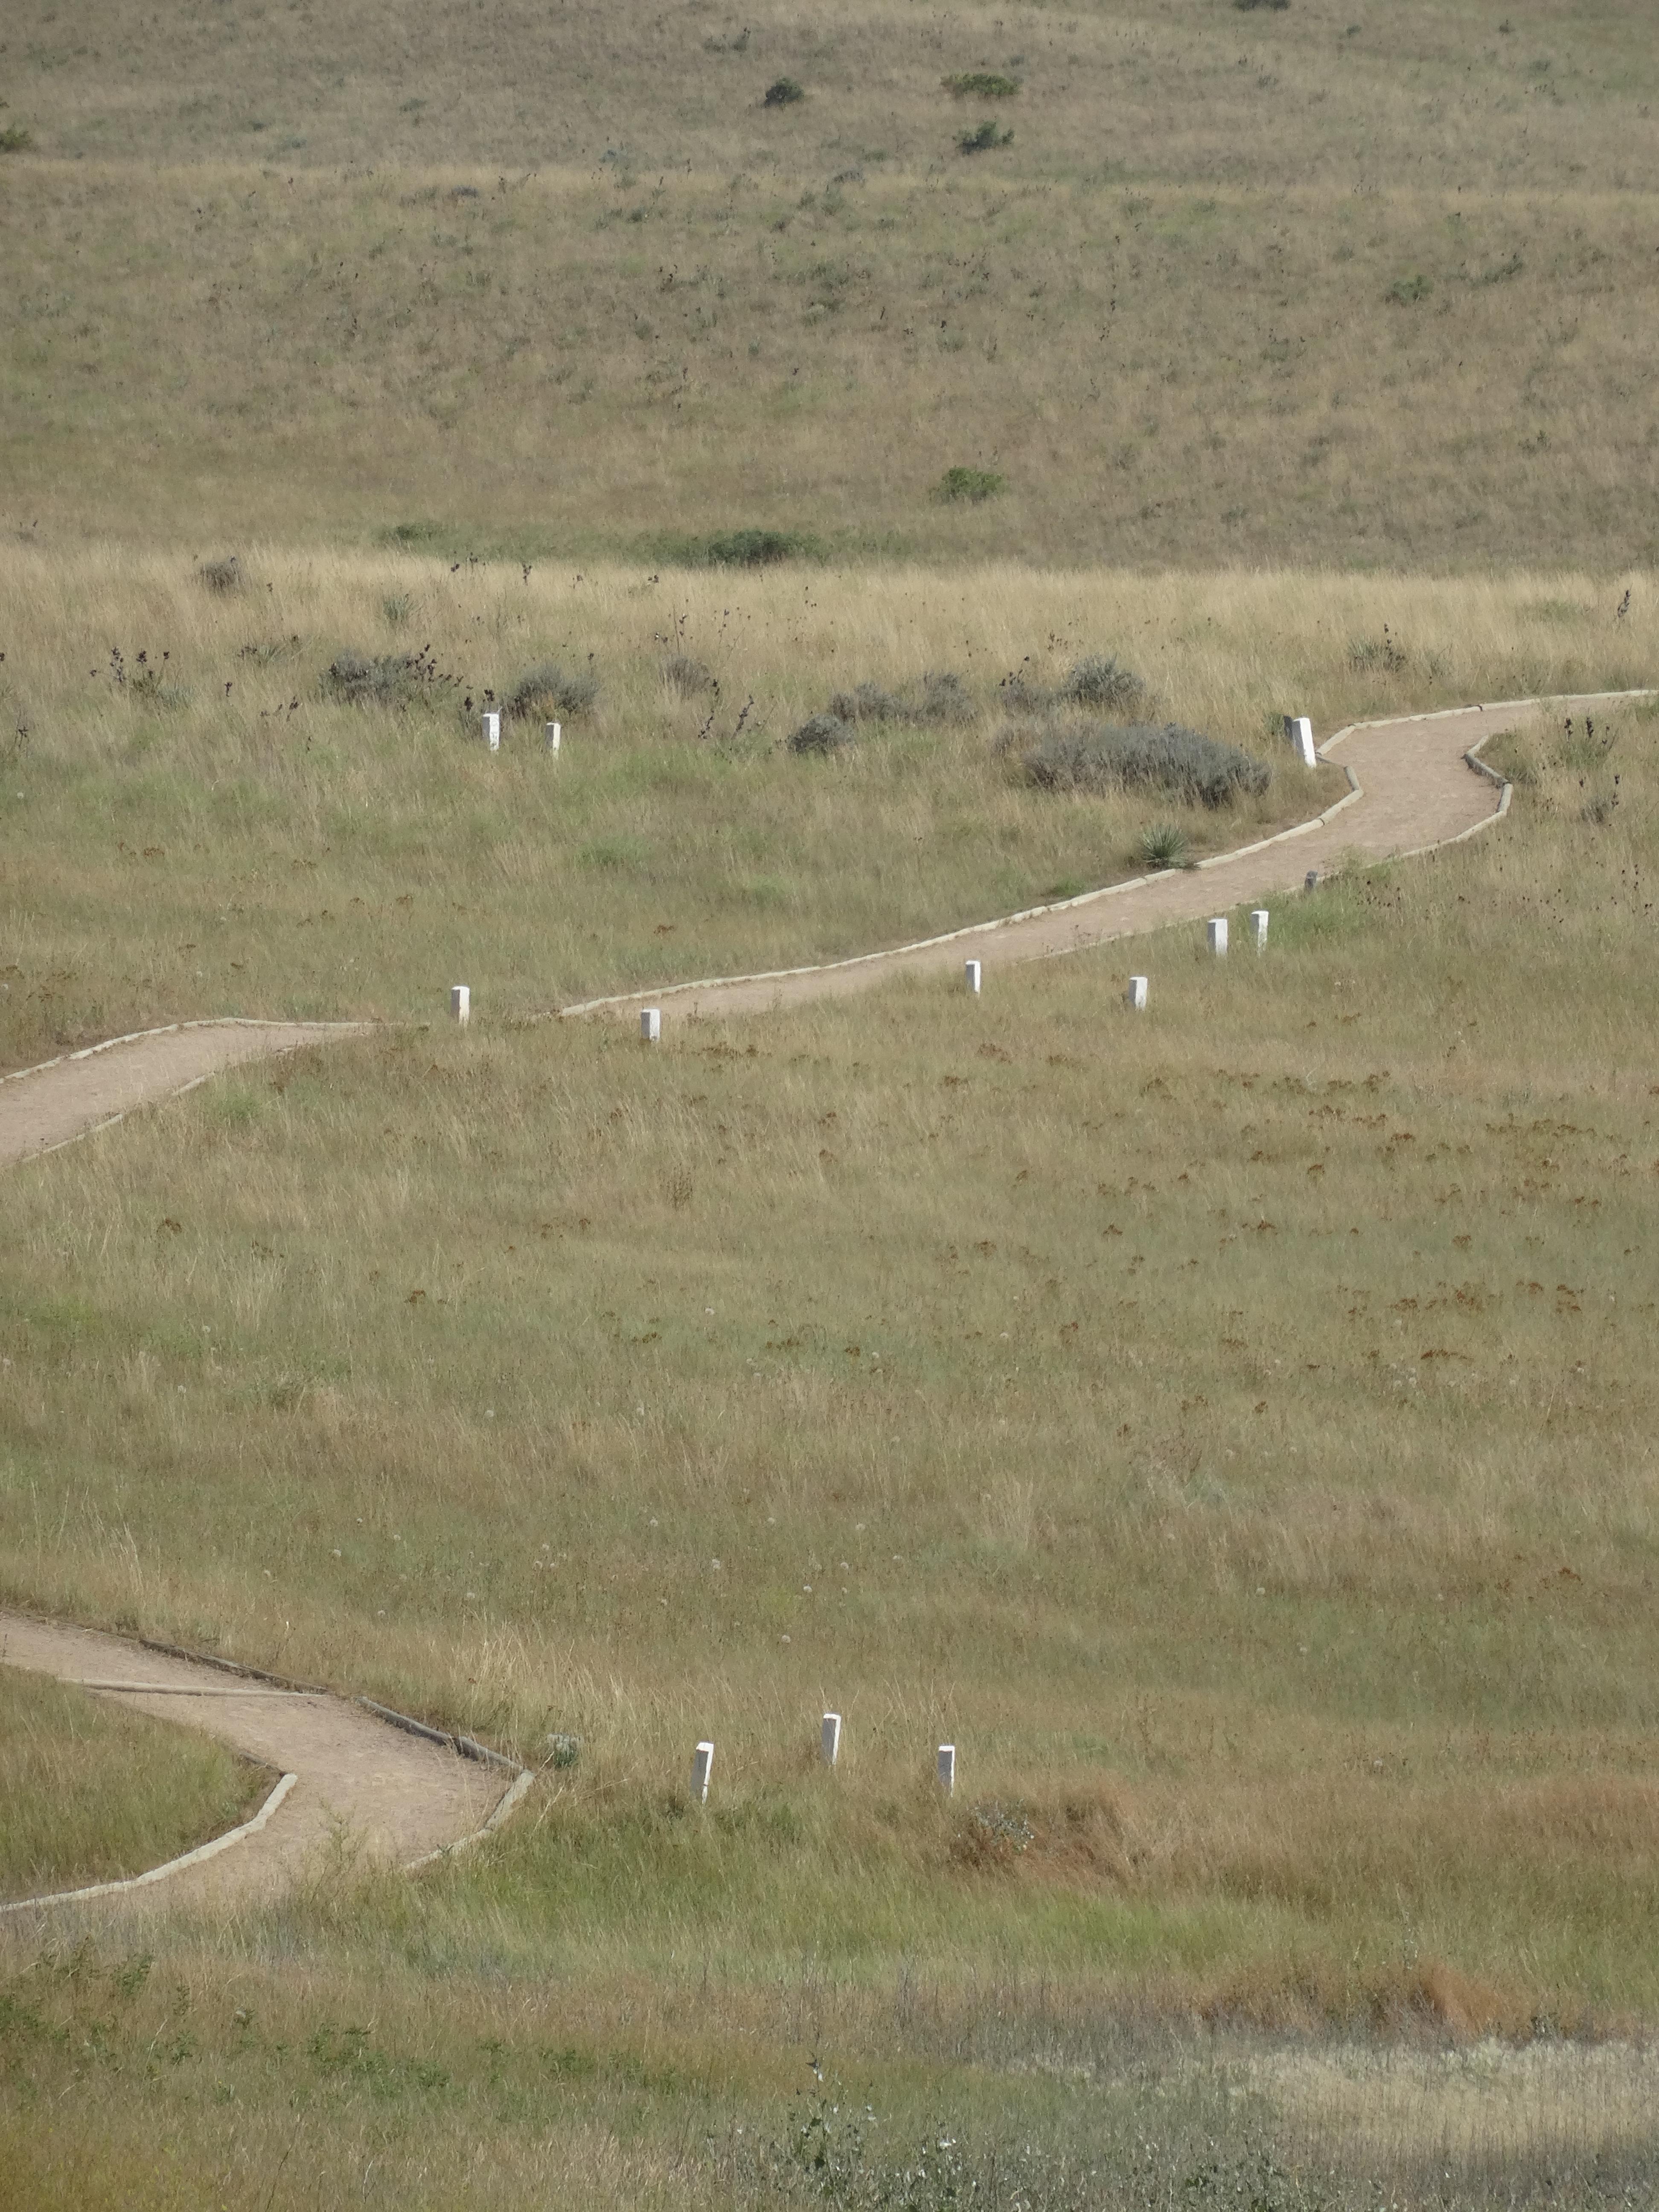 Path through Little Bighorn Battlefield